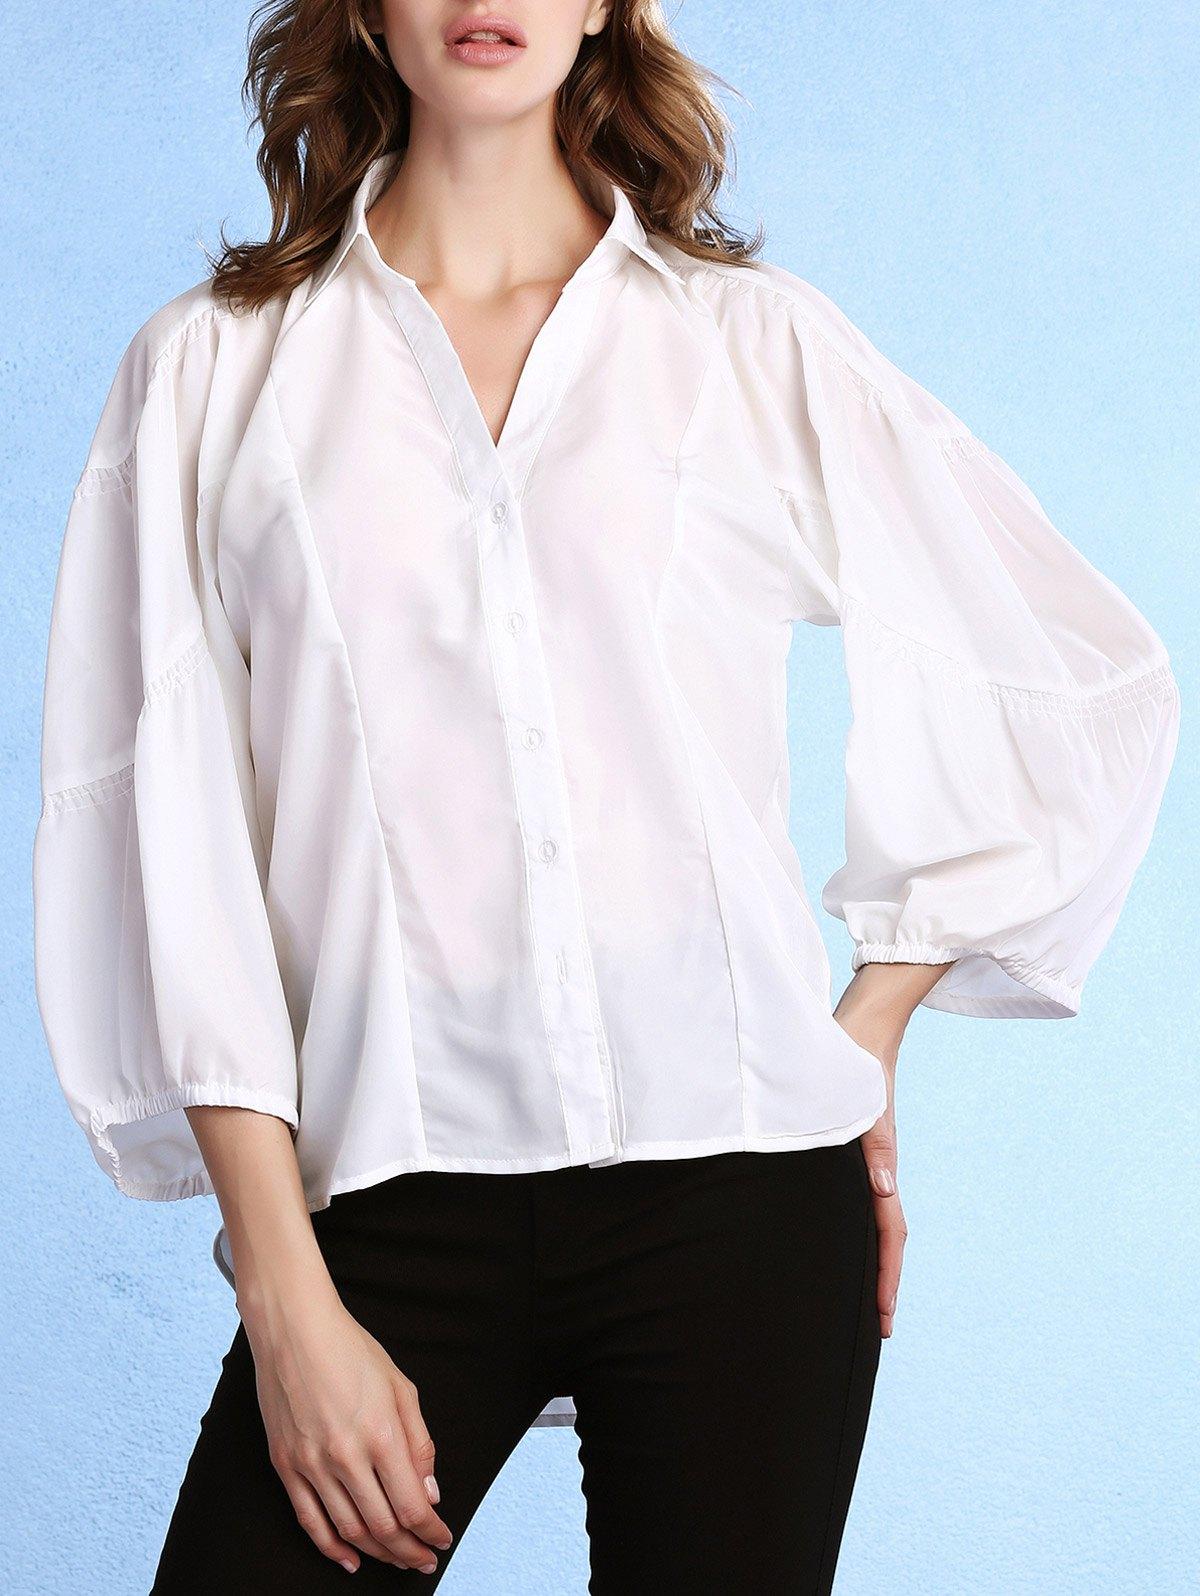 Lantern Sleeve Uneven Hem White Shirt